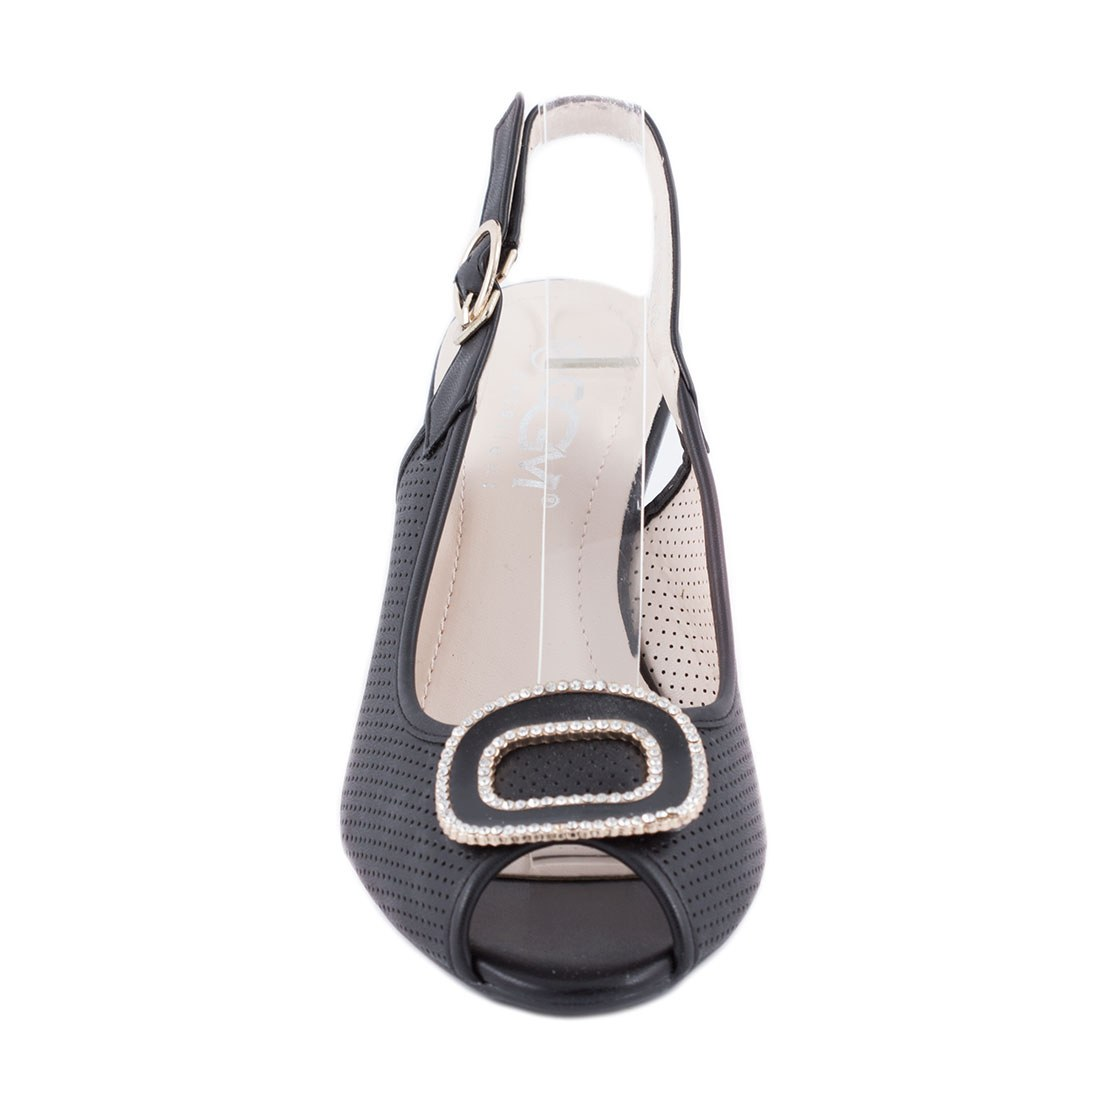 Sandale de dama cu talpa ortopedica B1-35-NEGRU